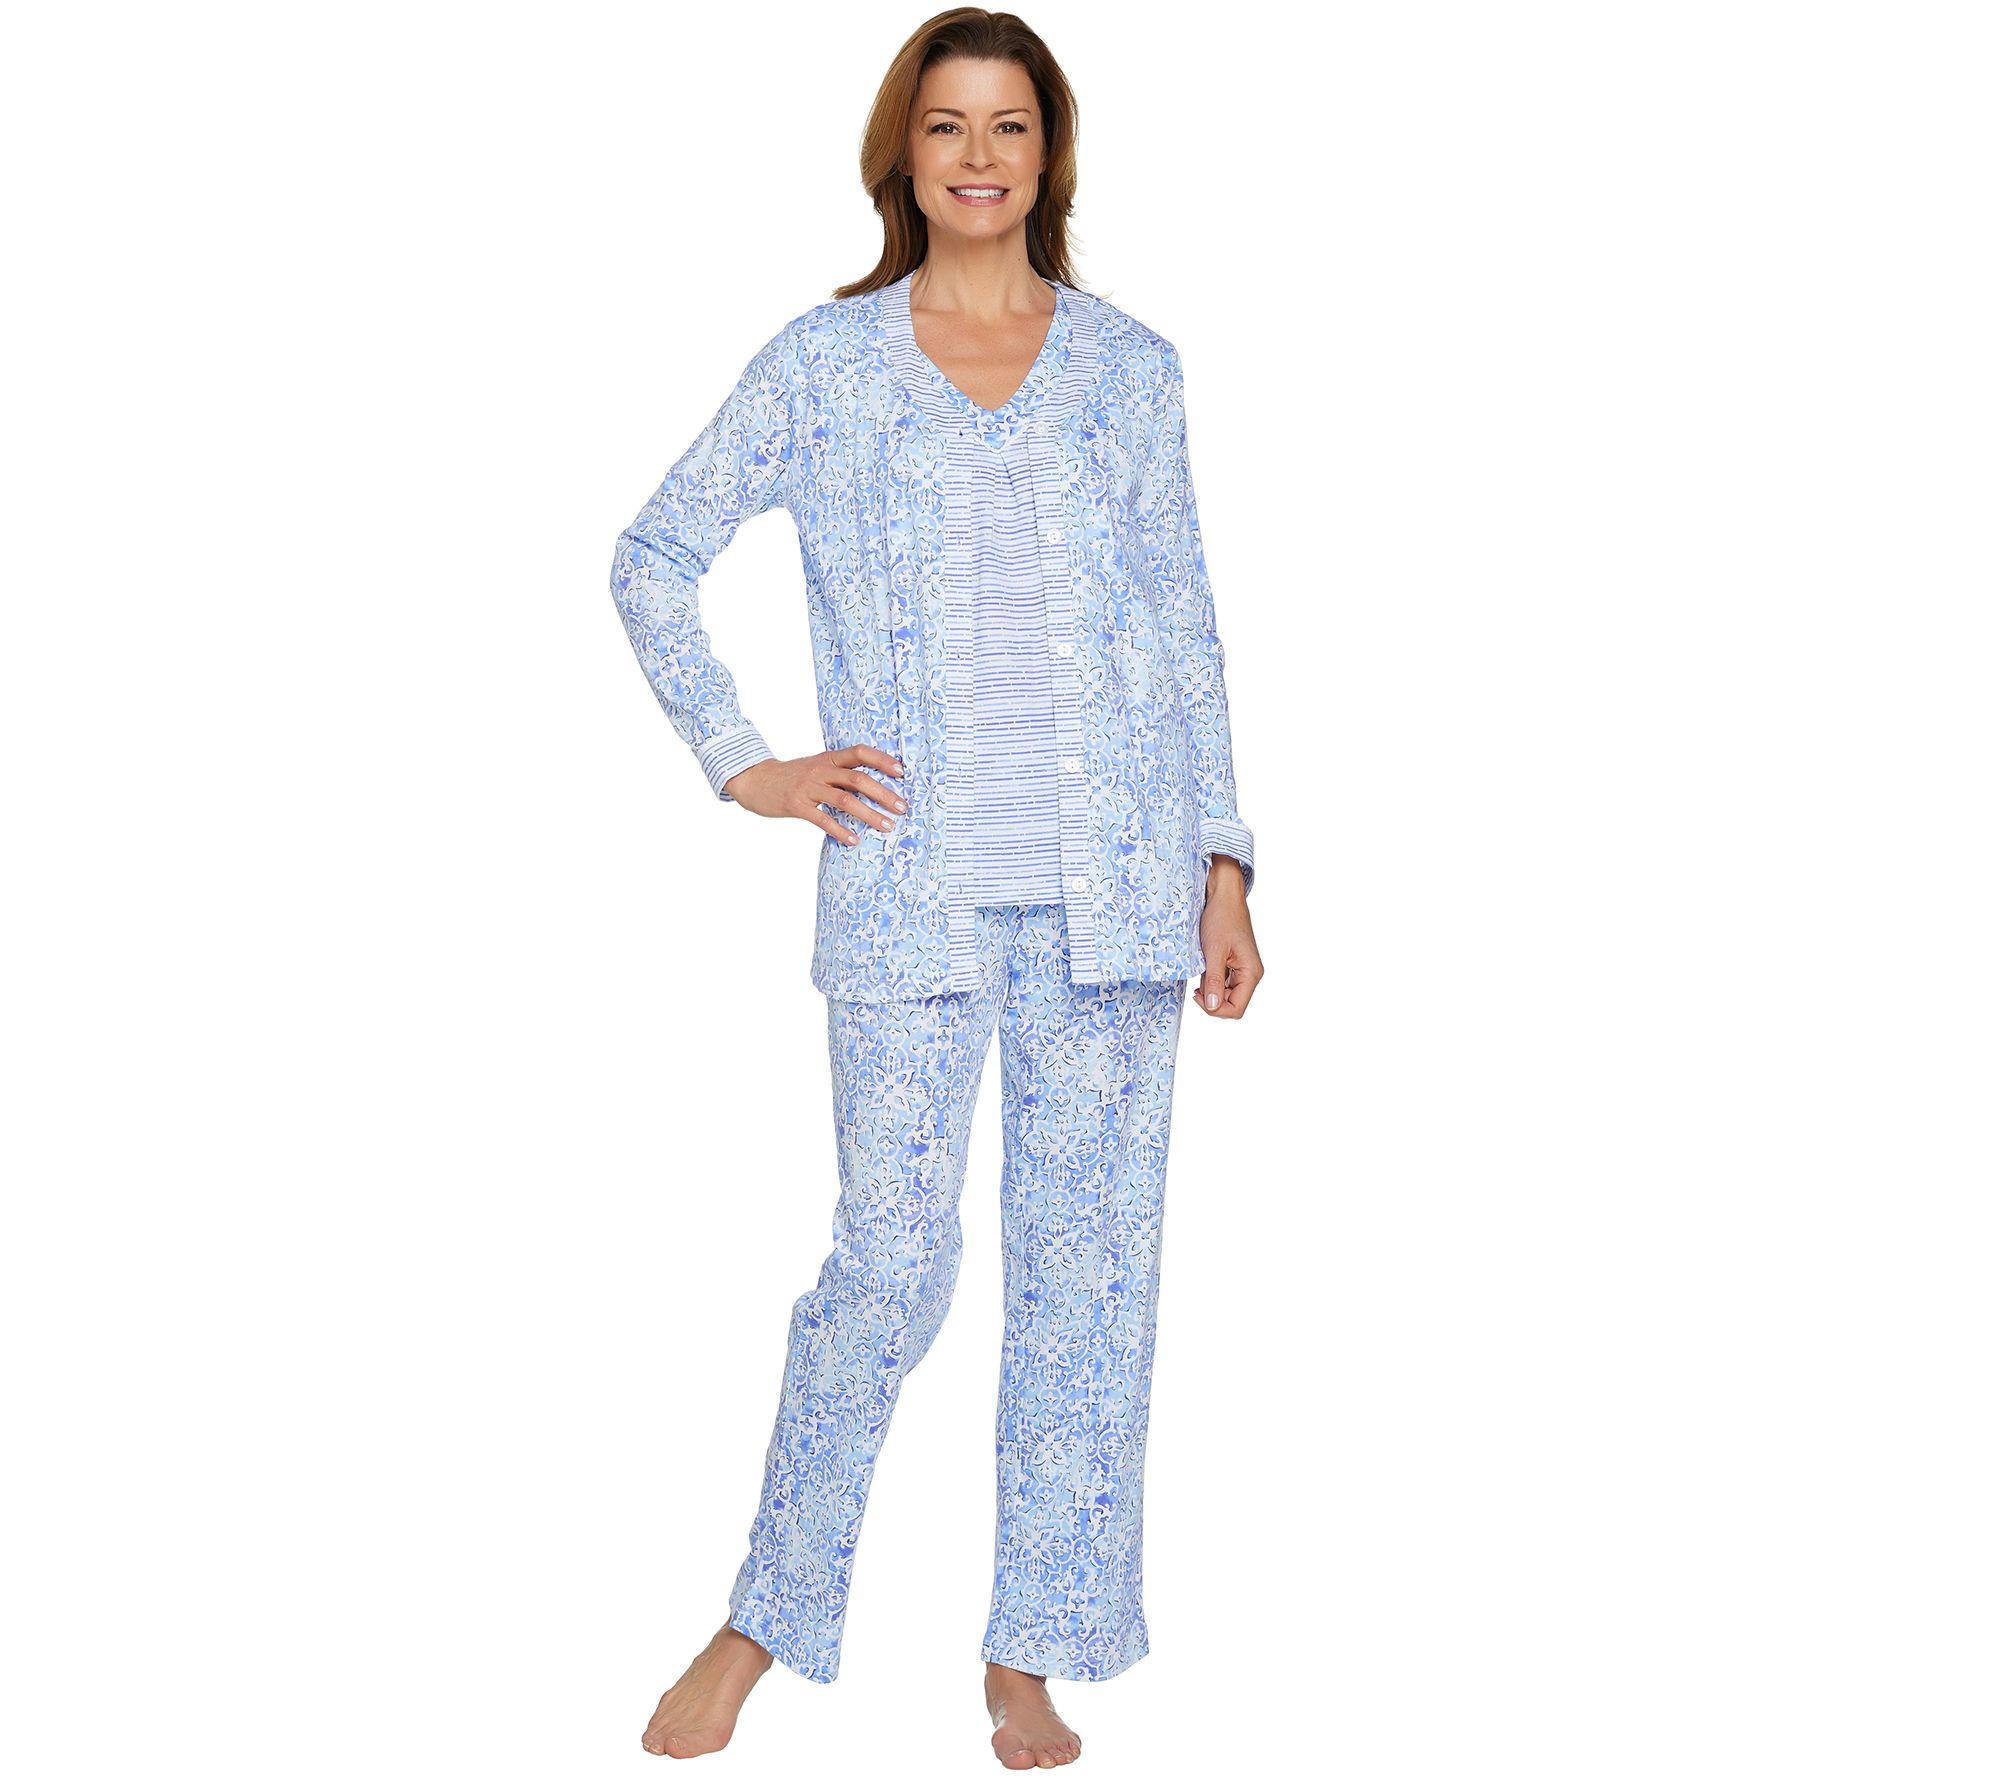 Petite womens pajamas breeze clothing for Women s flannel sleep shirt